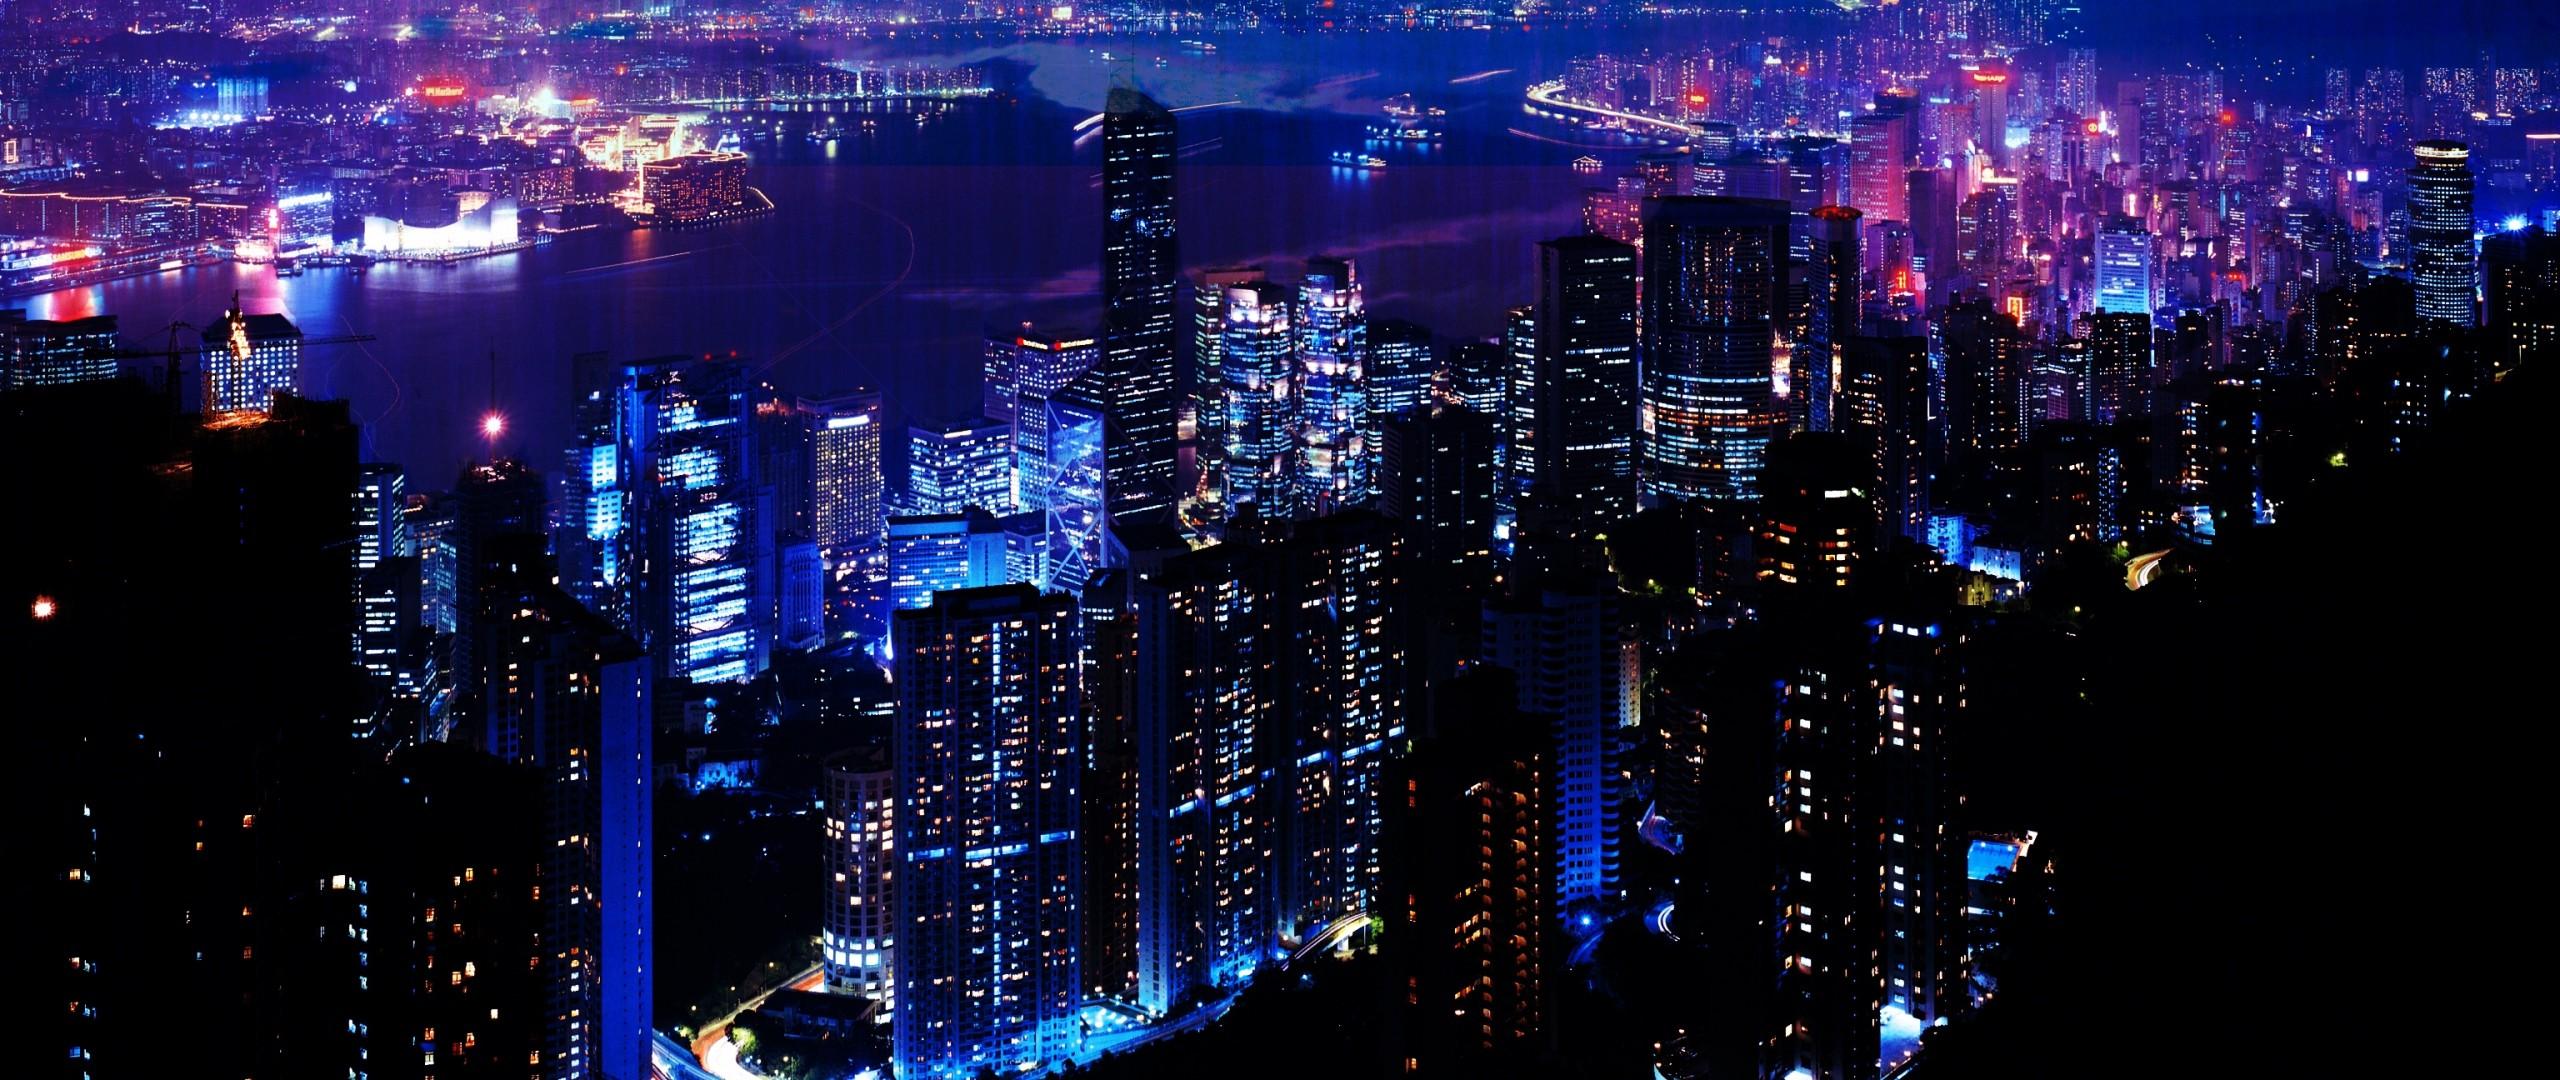 Wallpaper night, city, sky, skyscrapers